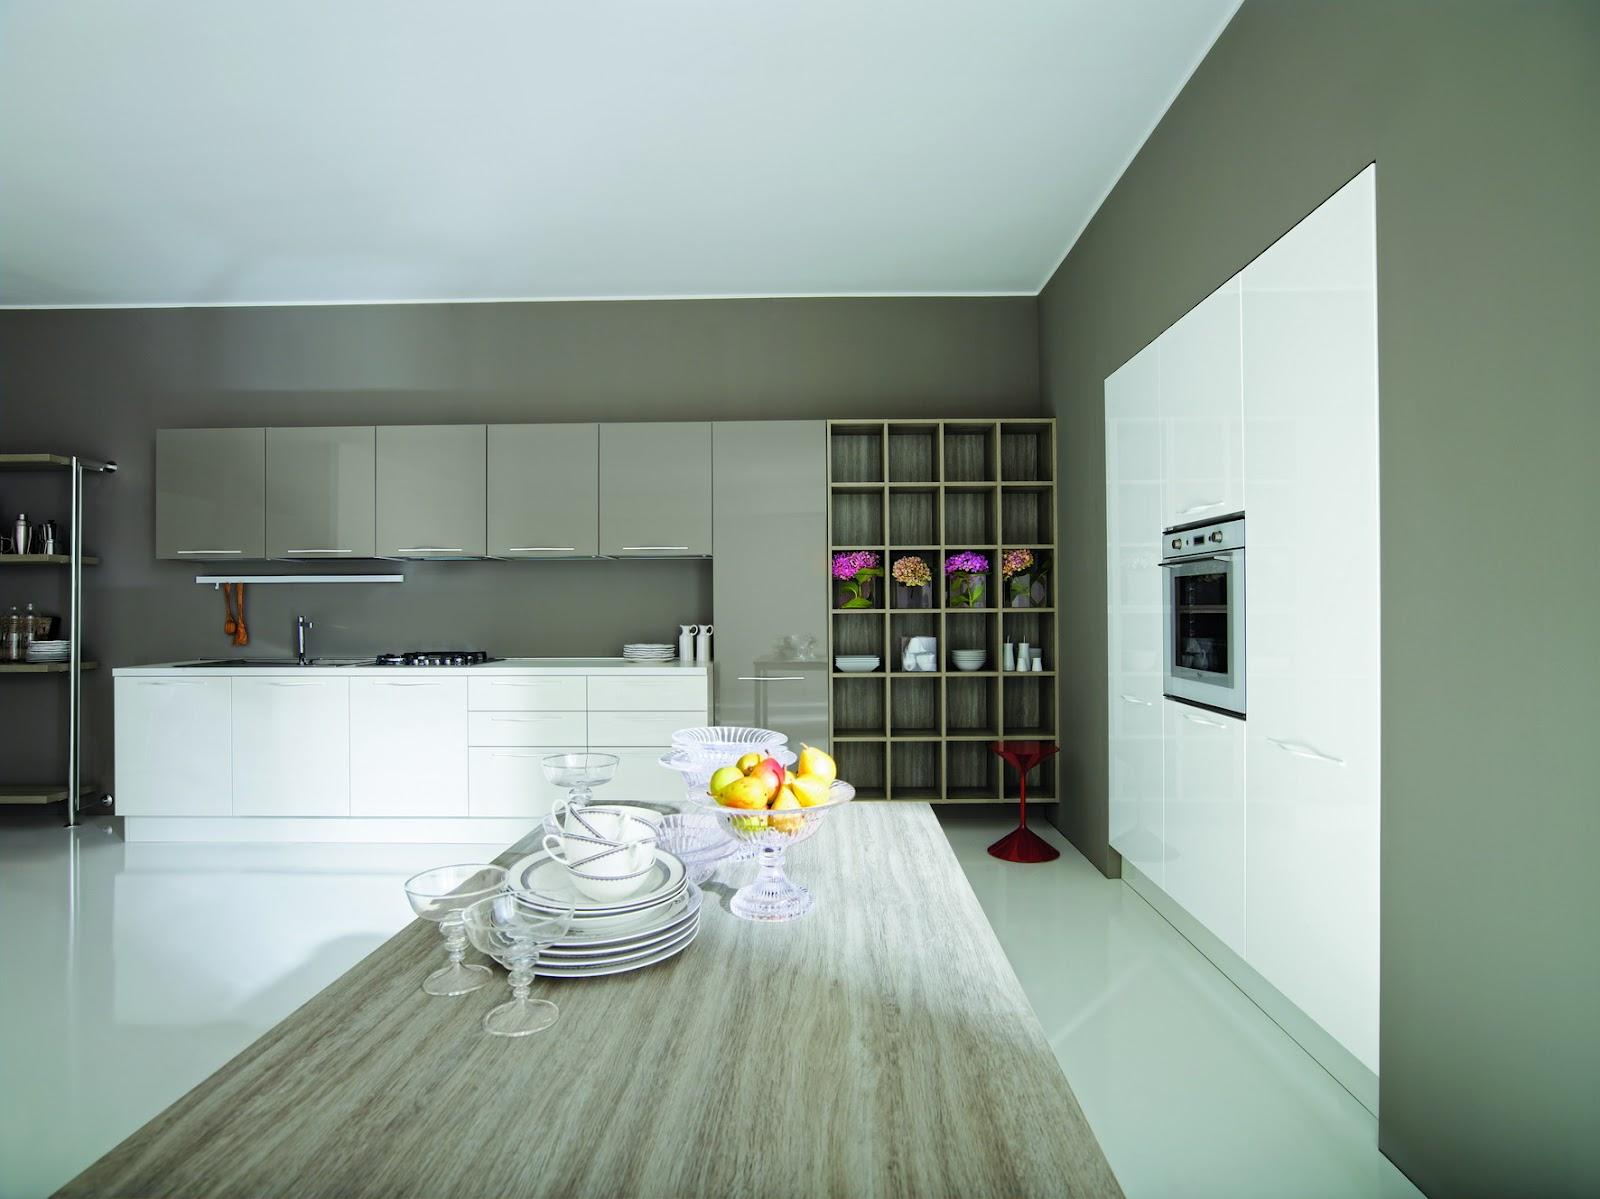 Casa e tecnologia aran cucina terra bianco tortora lucido for Arredamento bianco e tortora